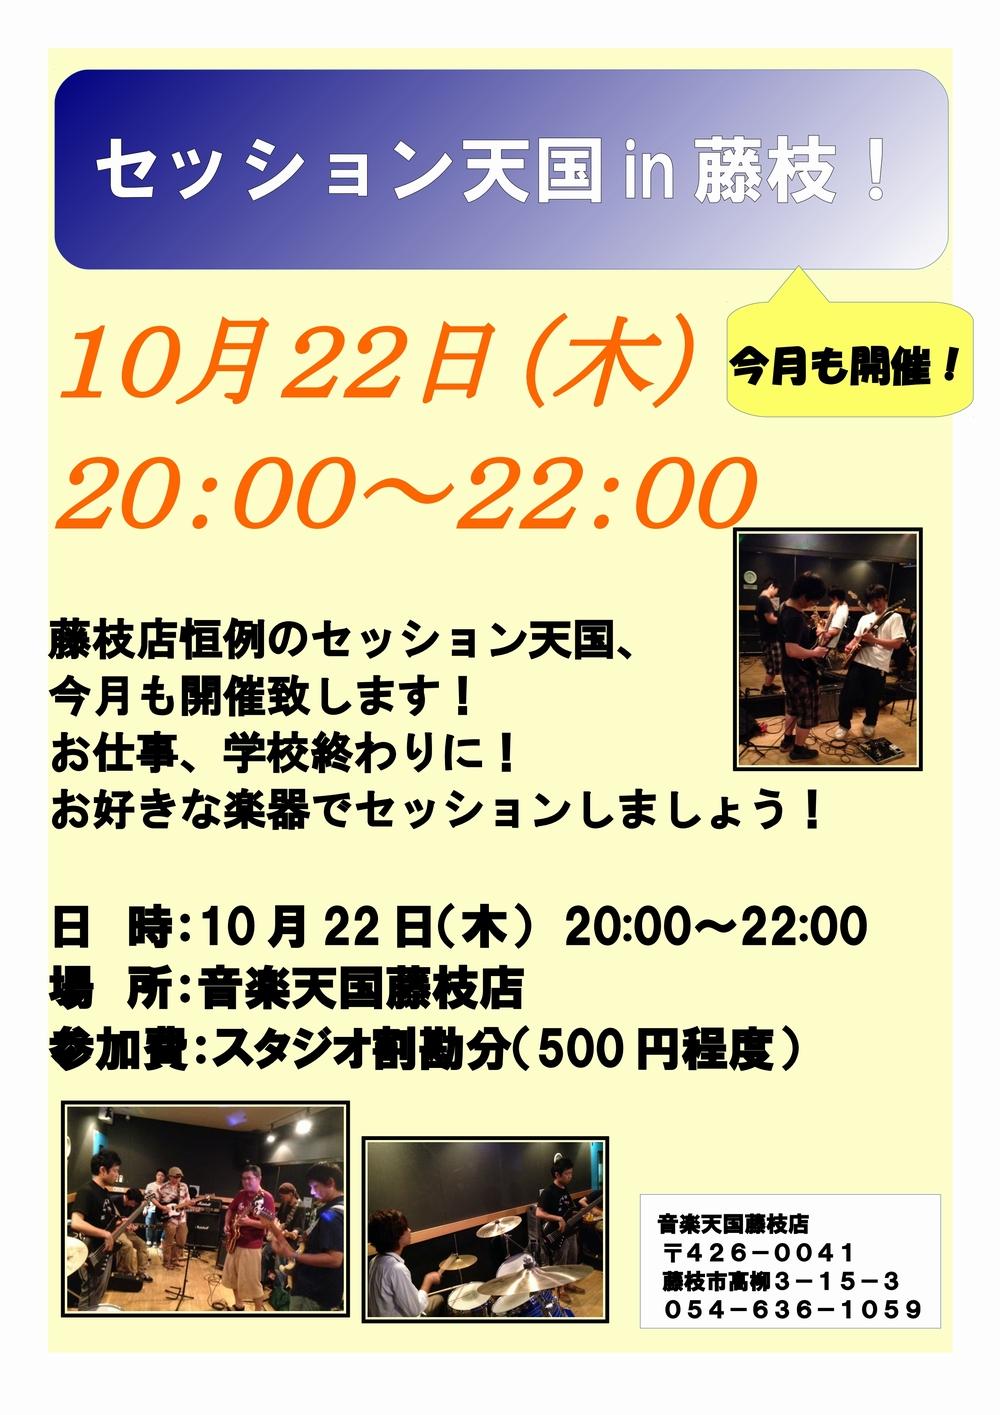 【セッション天国】@音楽天国・藤枝店10月22日(木)開催